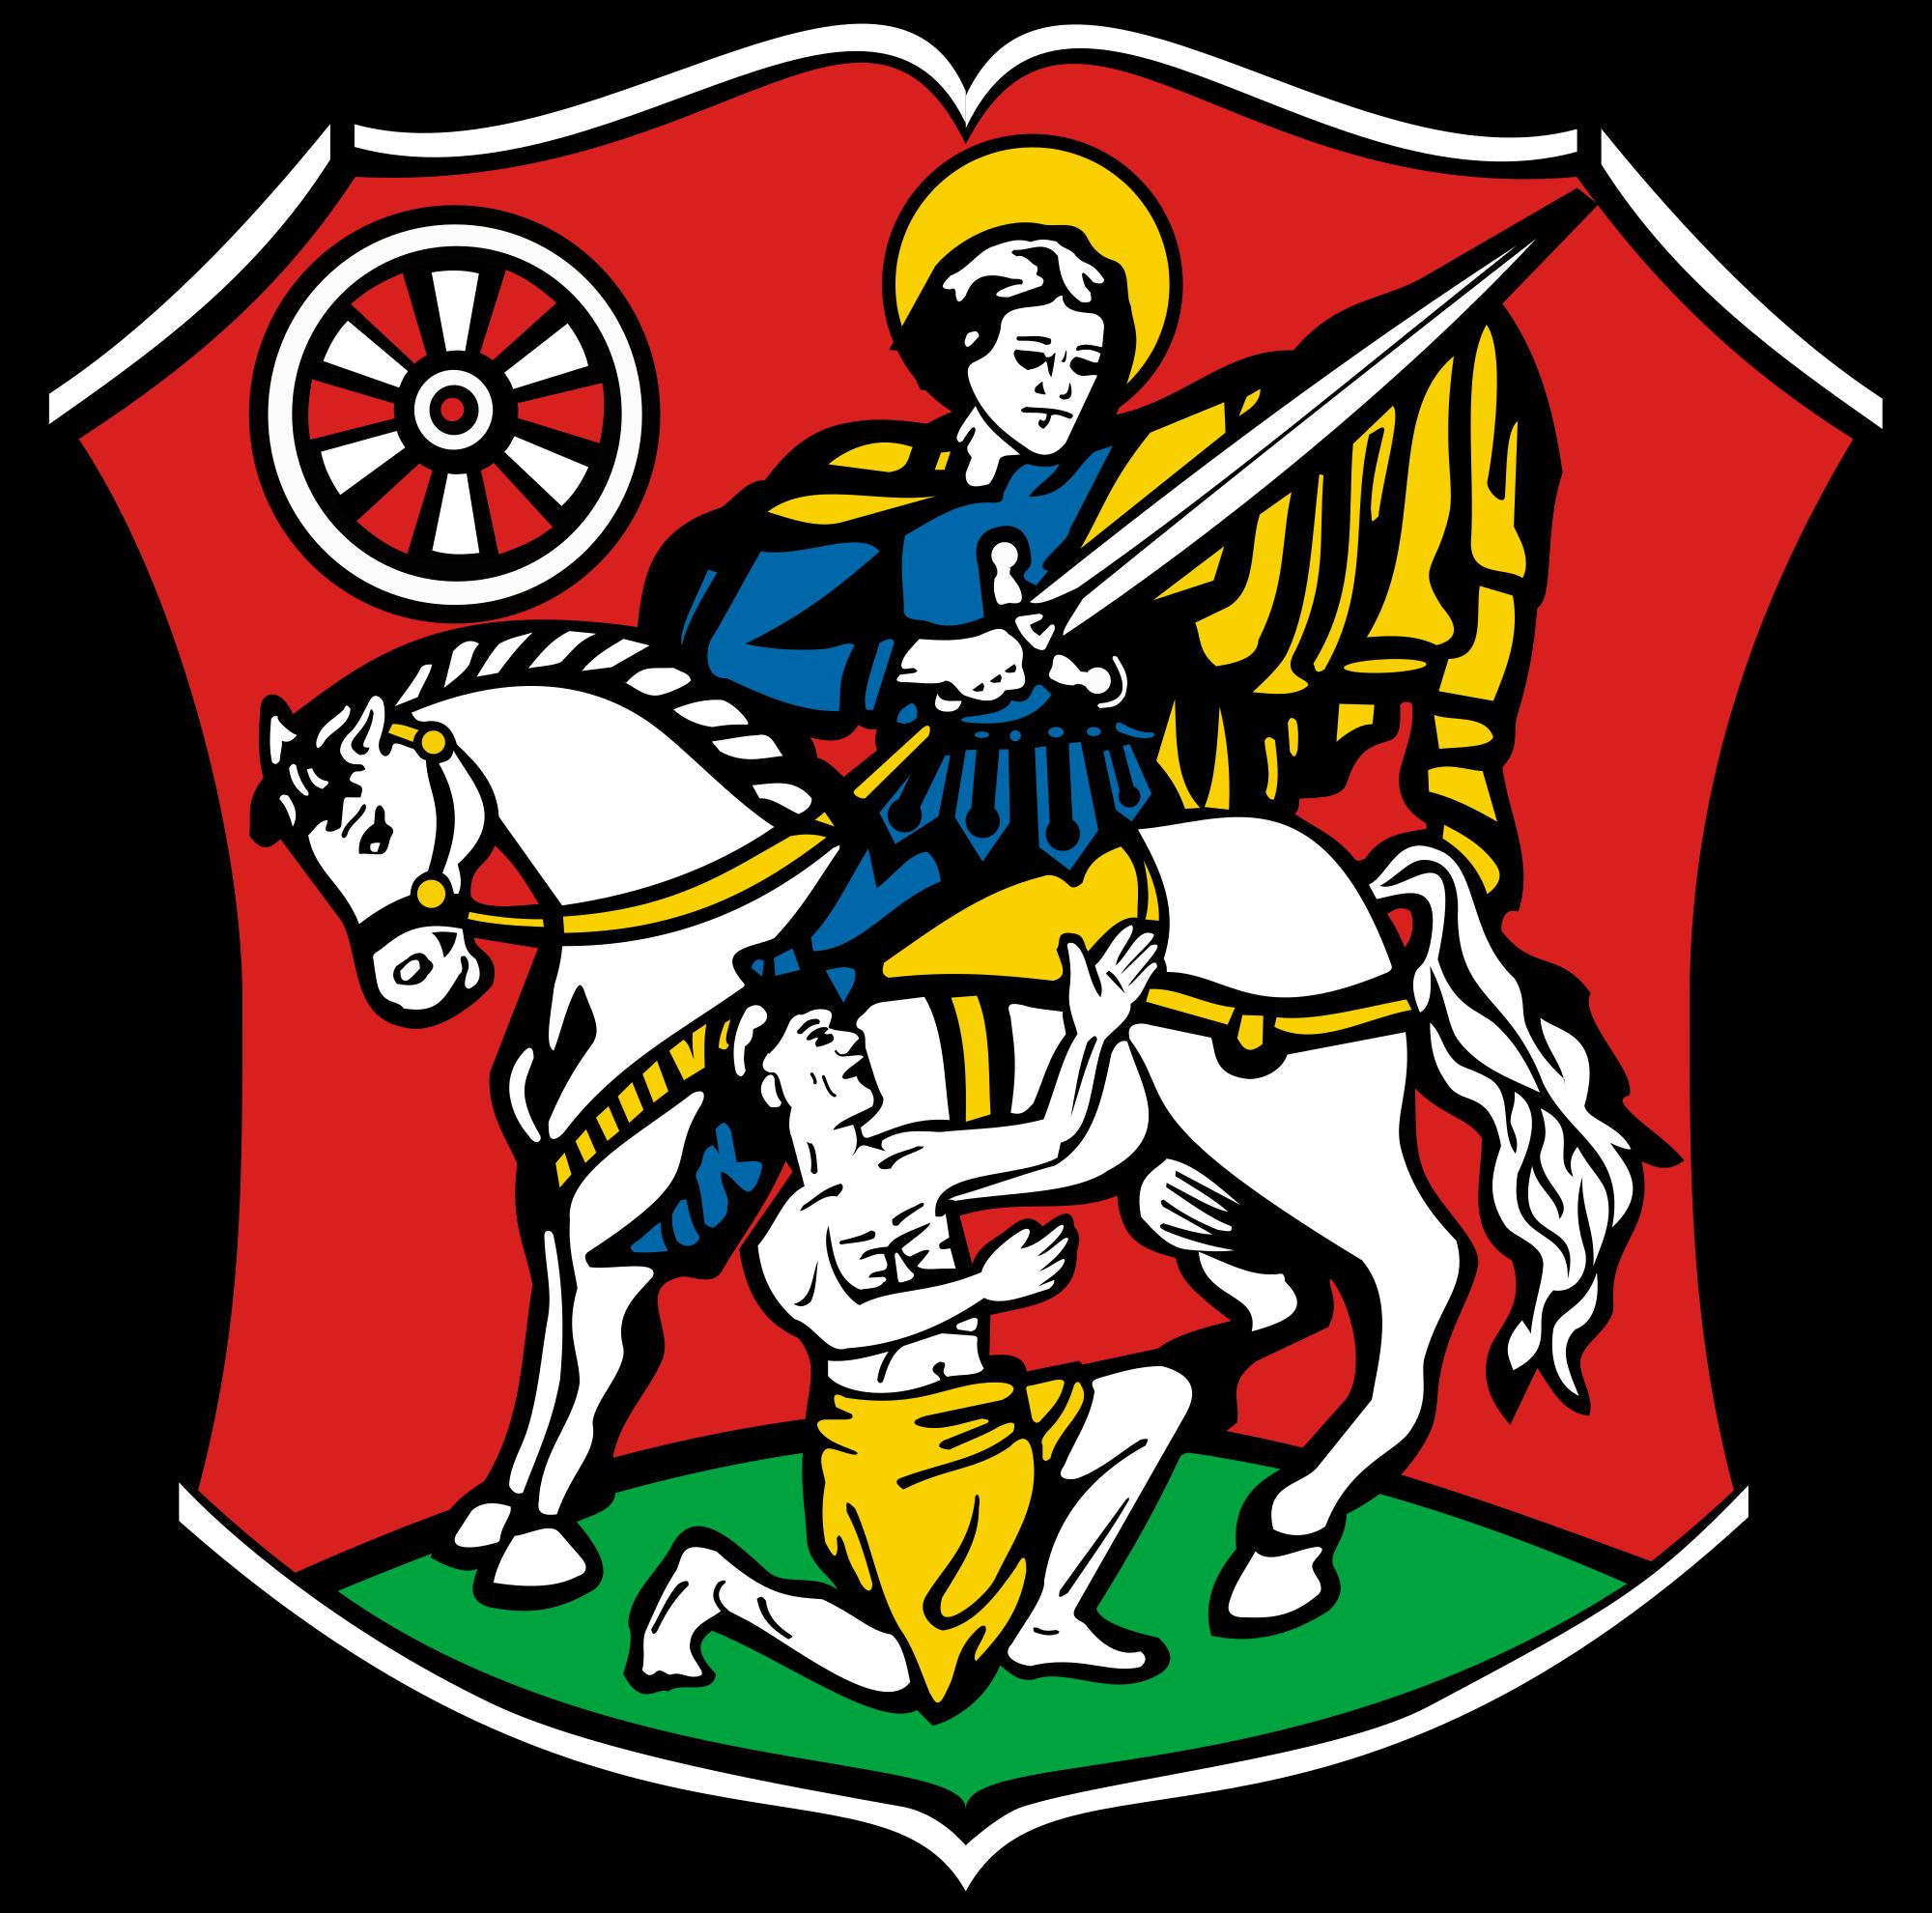 File:Wappen Neustadt (Hessen).svg.